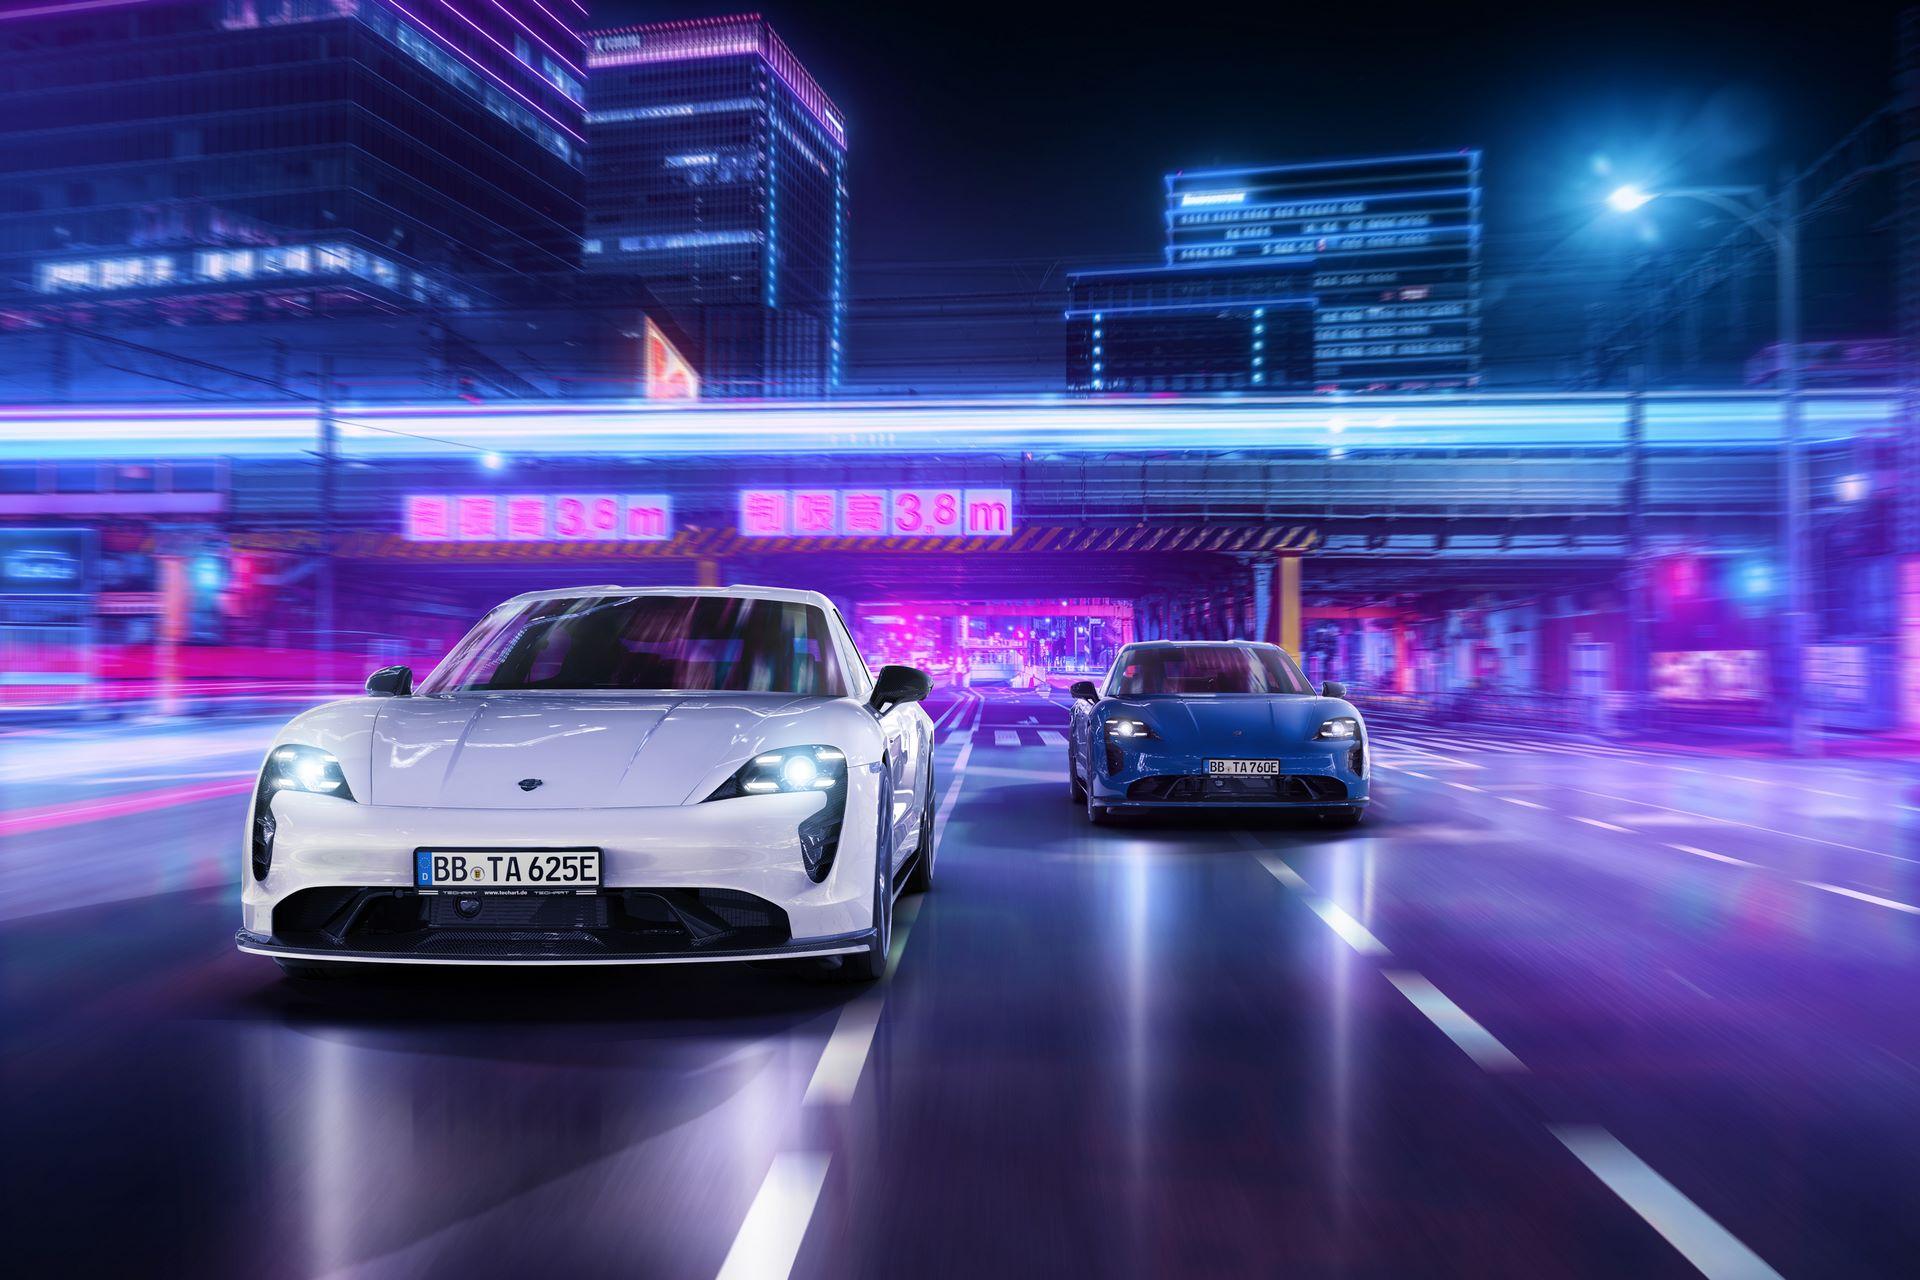 Porsche-Taycan-bodykit-by-TechArt-6